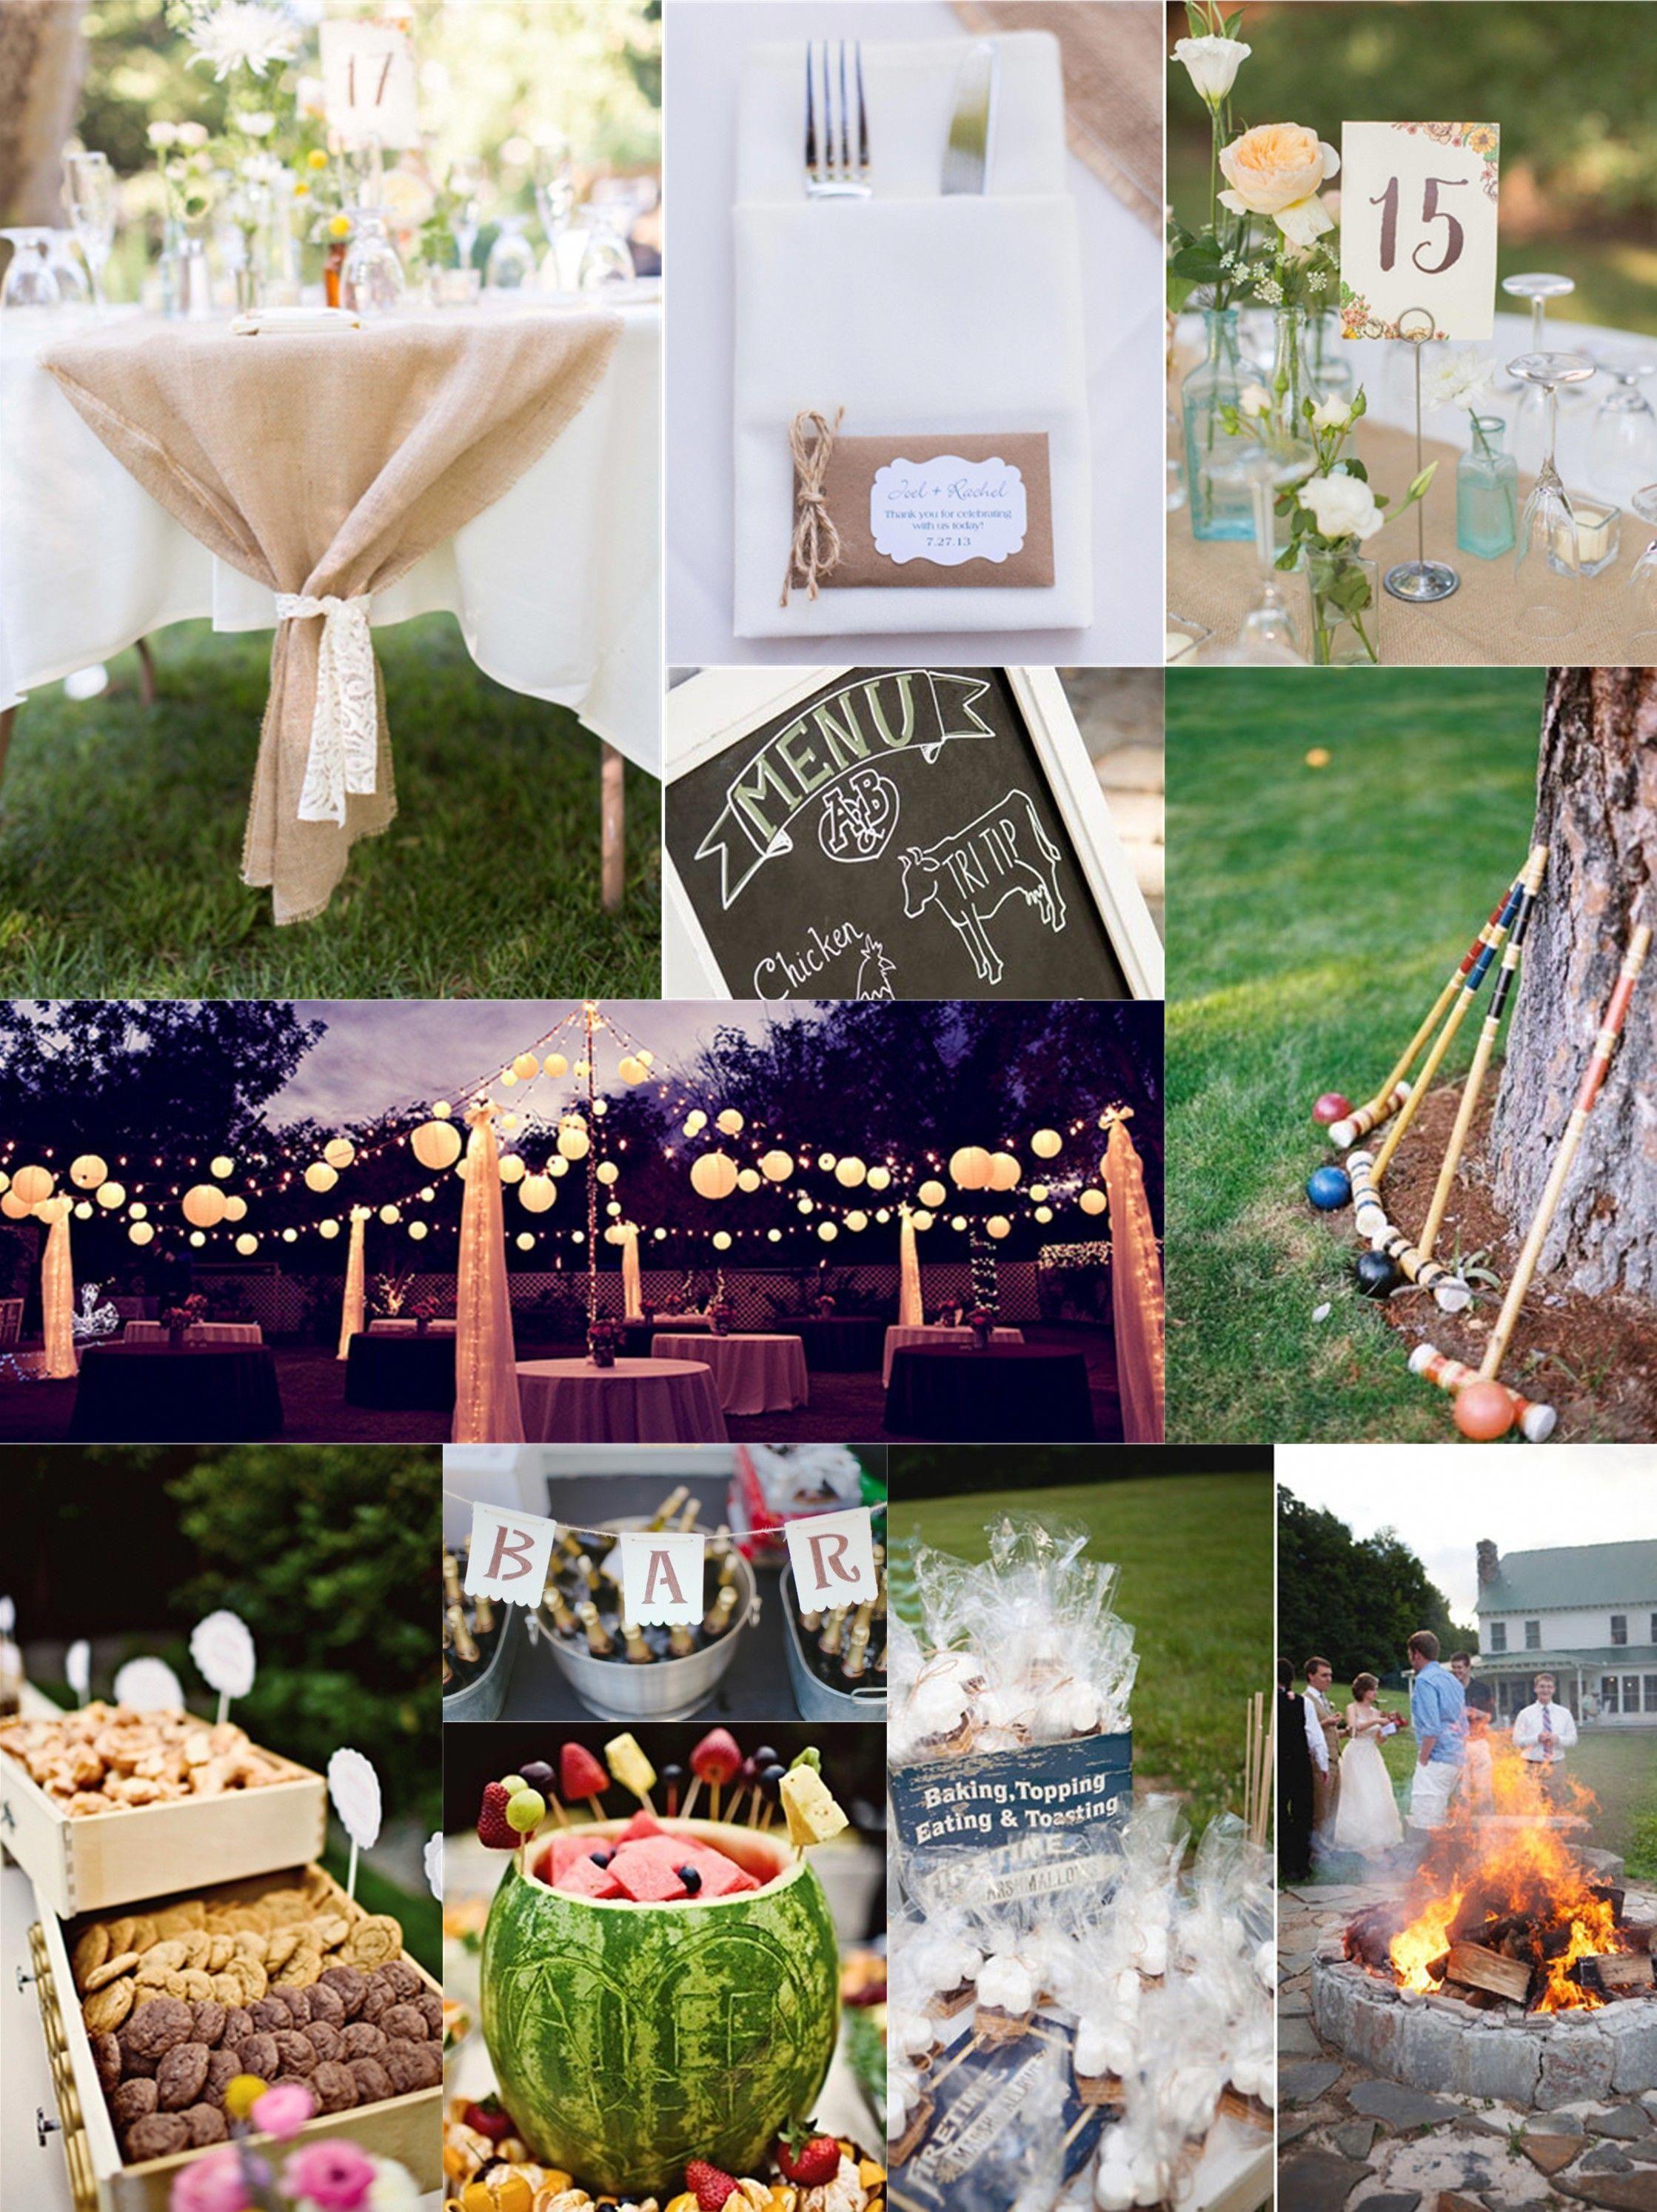 15 Smart Ideas How to Build Backyard Wedding Ideas On A